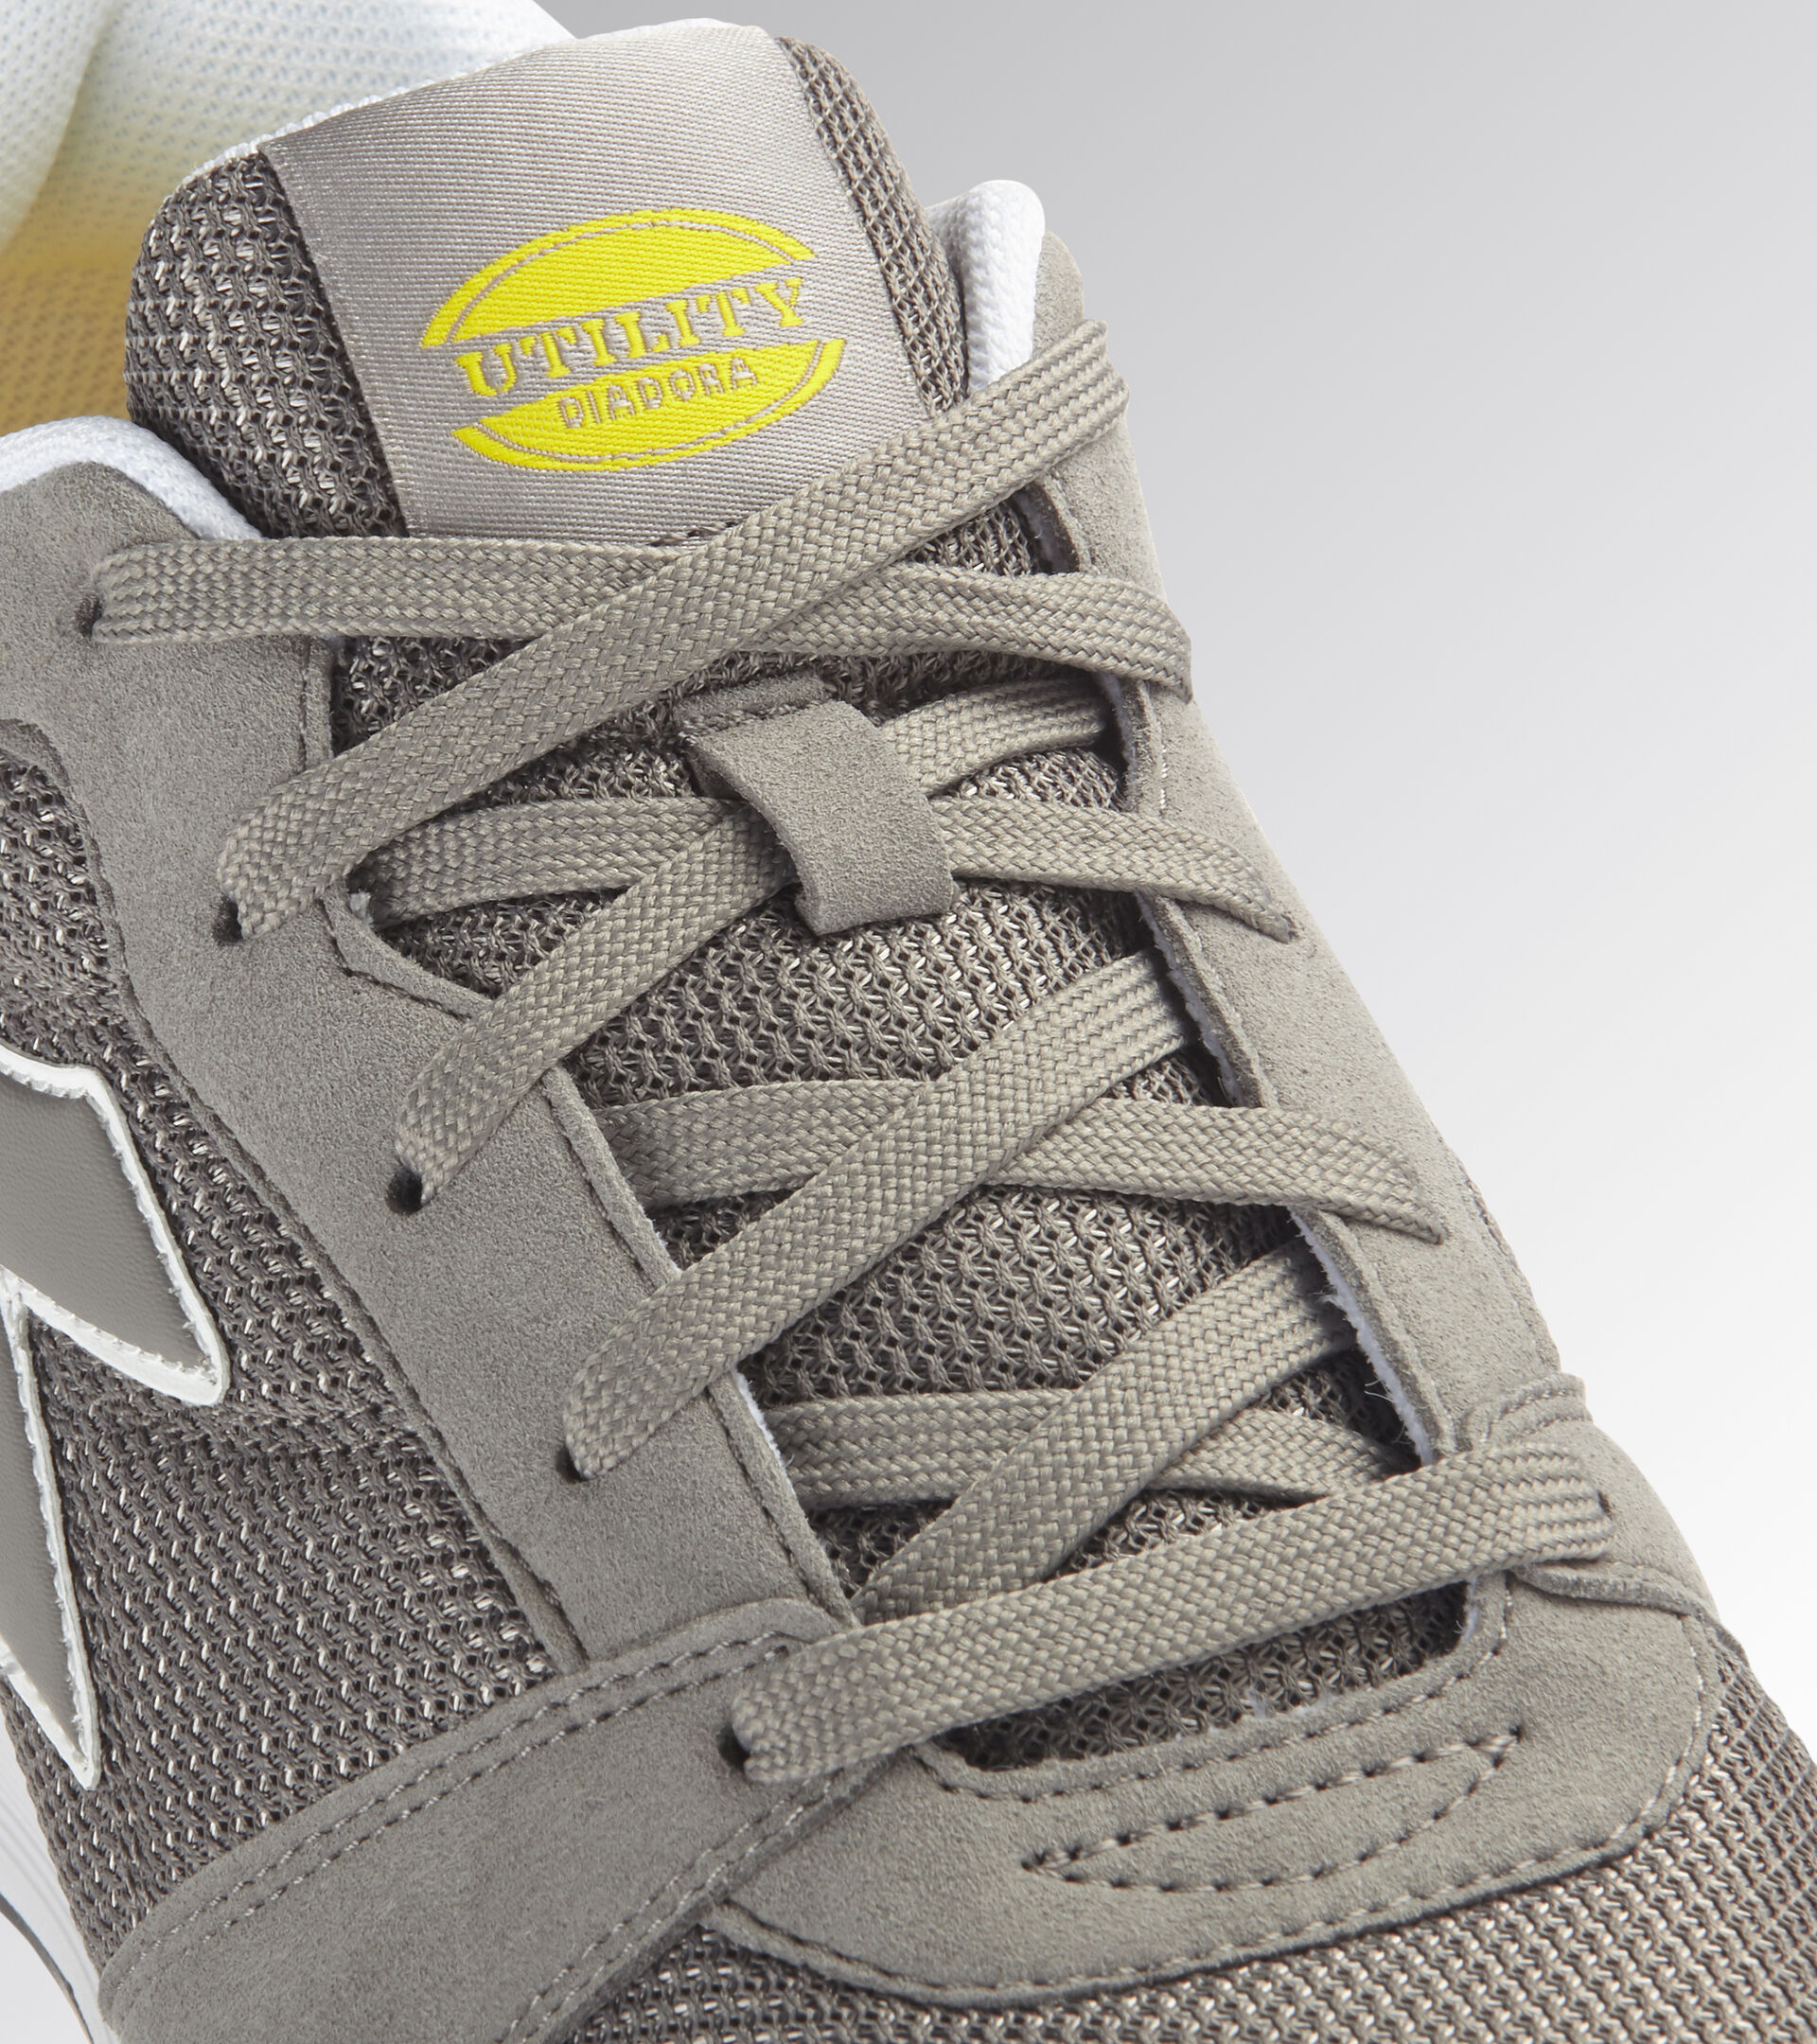 Footwear Utility UNISEX CREW MICROMESH OB SRC WIND GRAY Utility